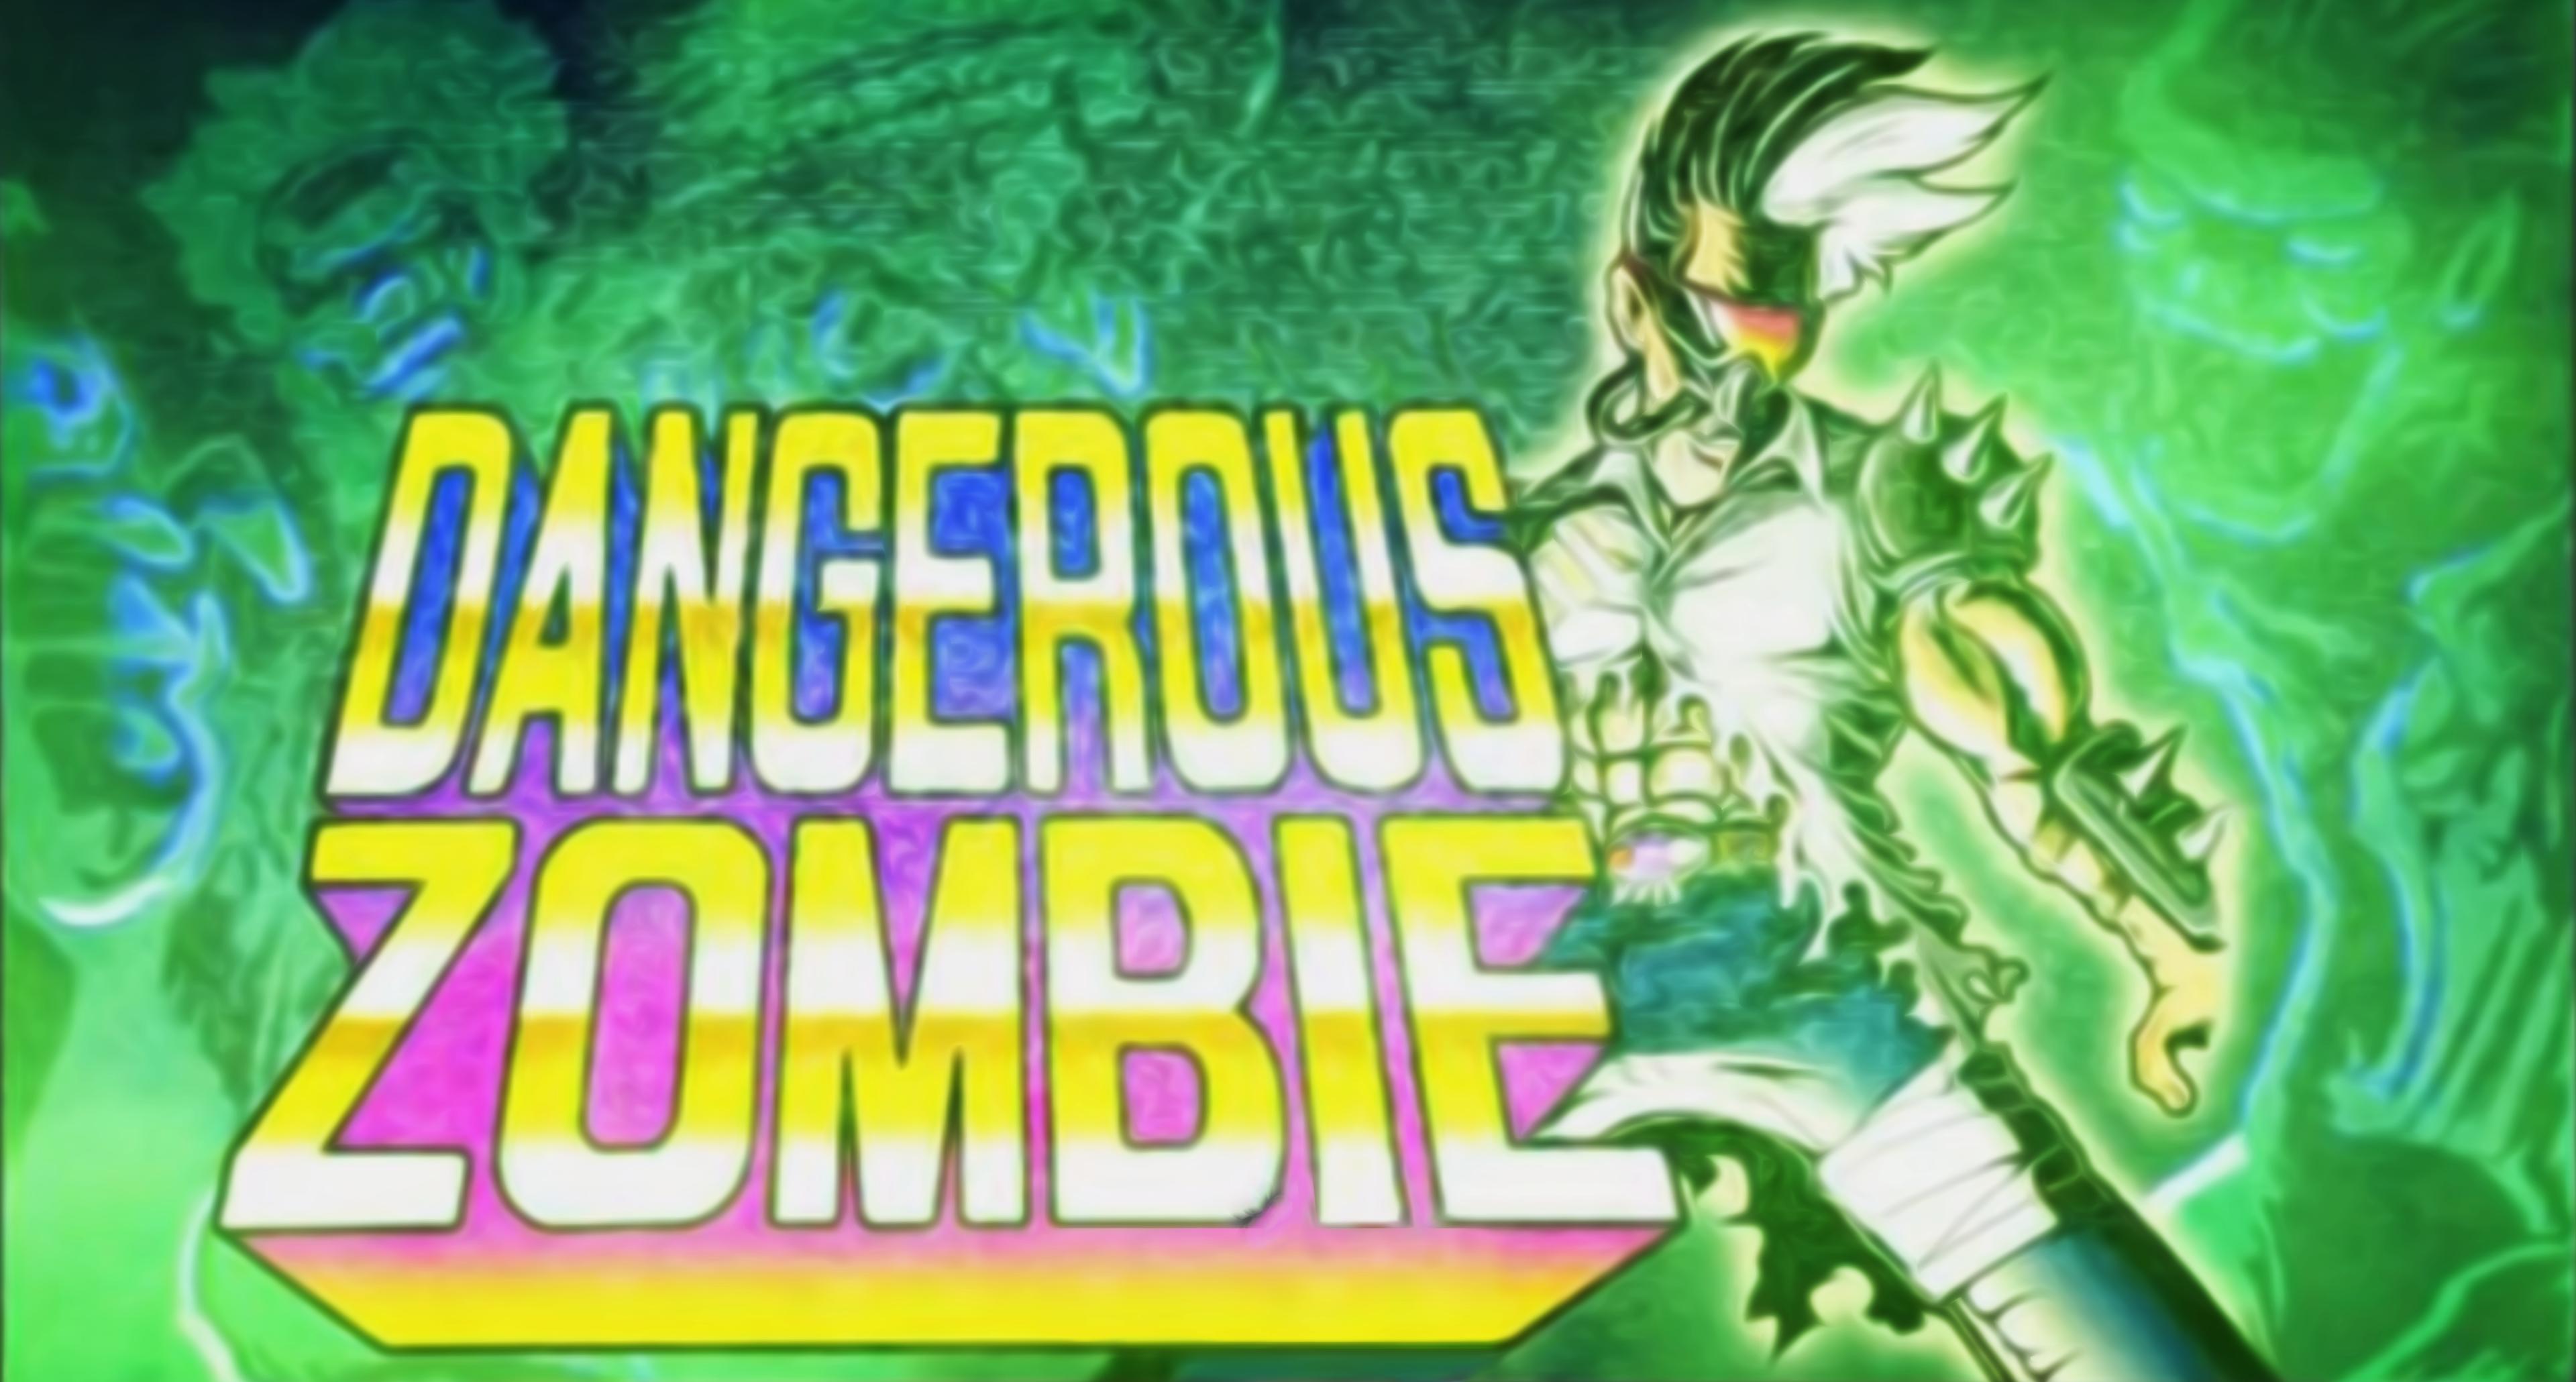 Dangerous Zombie